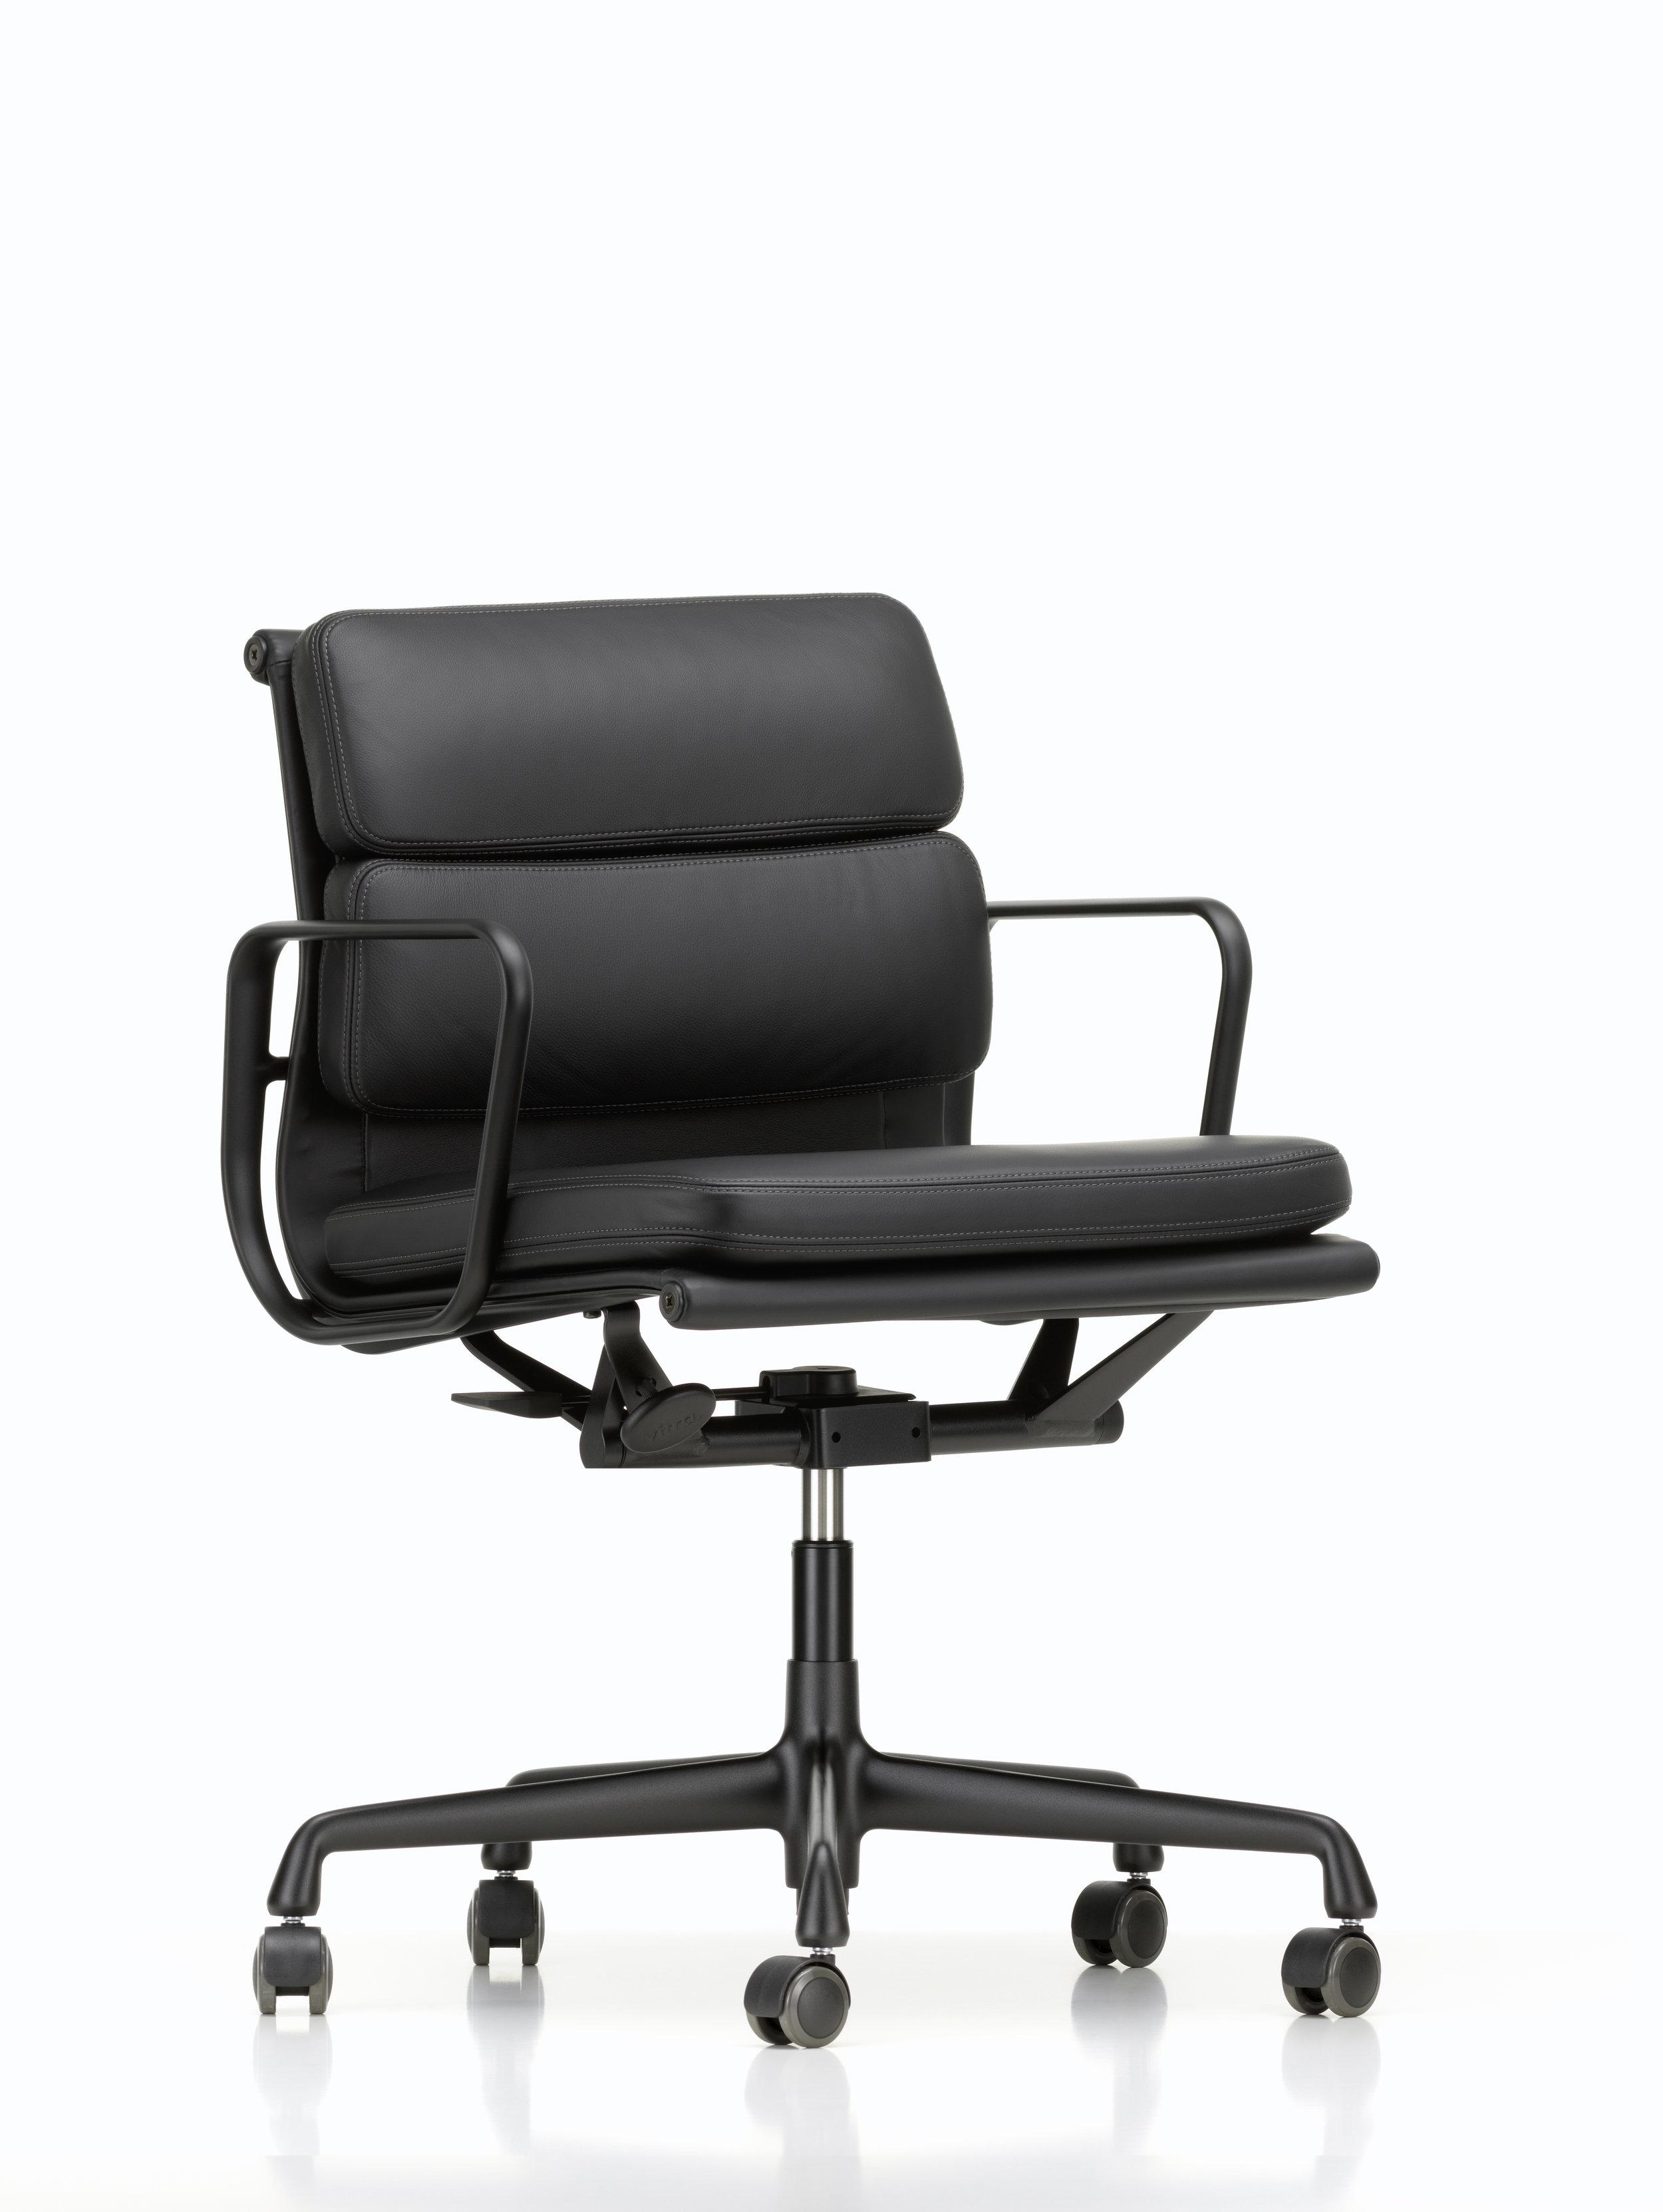 Vitra Loncin Hasselt Leuven Zoutleeuw Mechelen brussel Bruxelles brabant en Limburg design meubelwinkel  2512025_Soft Pad Chair EA 217_master.jpg